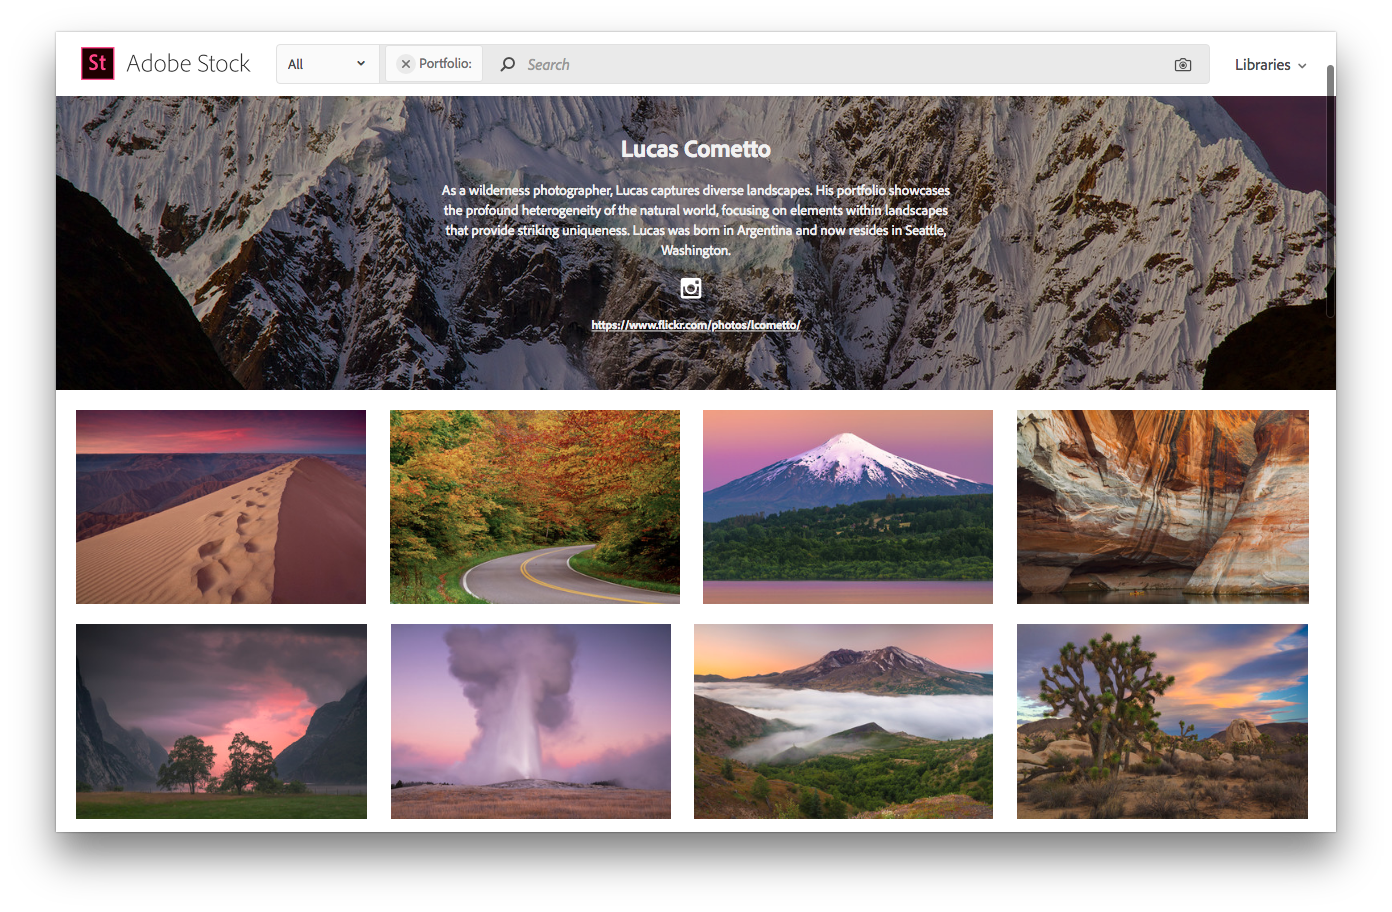 Adobe Stock Profile